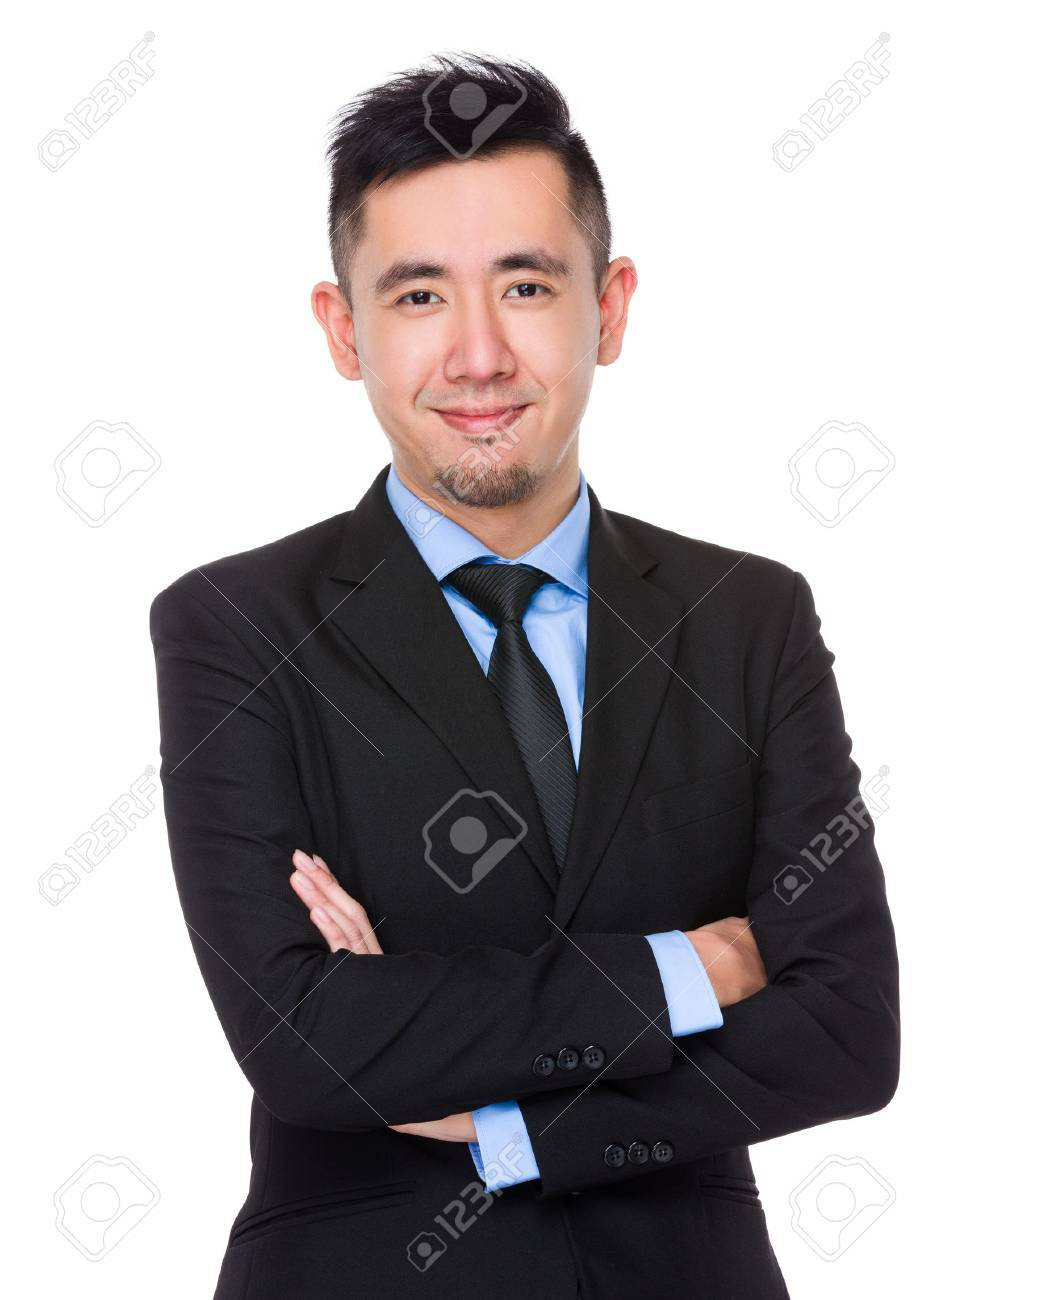 Asian Businessman - 53004120